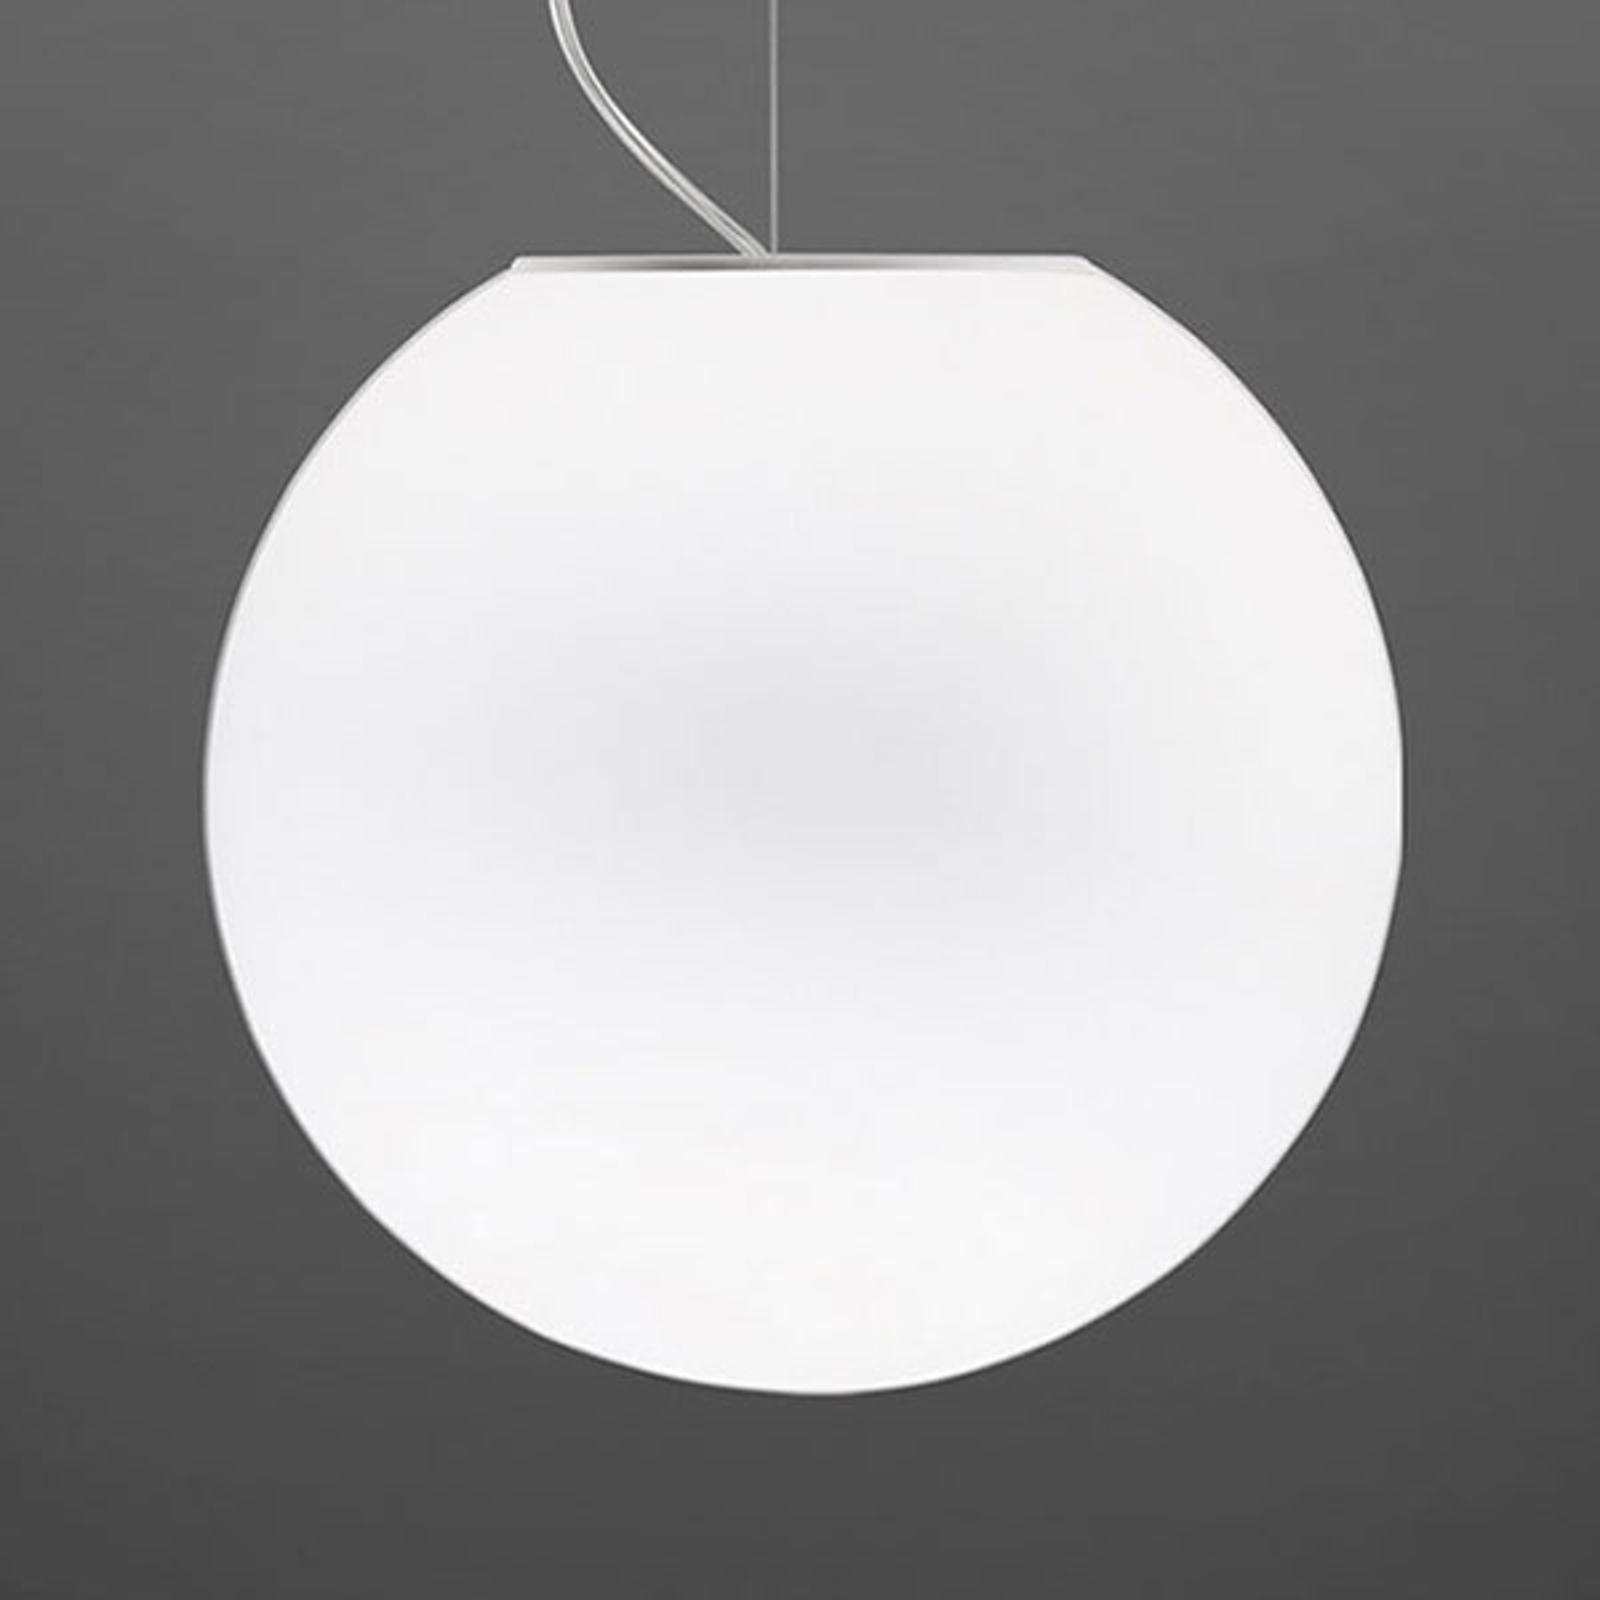 Fabbian Lumi Sfera Glas-Hängeleuchte, Ø 40 cm